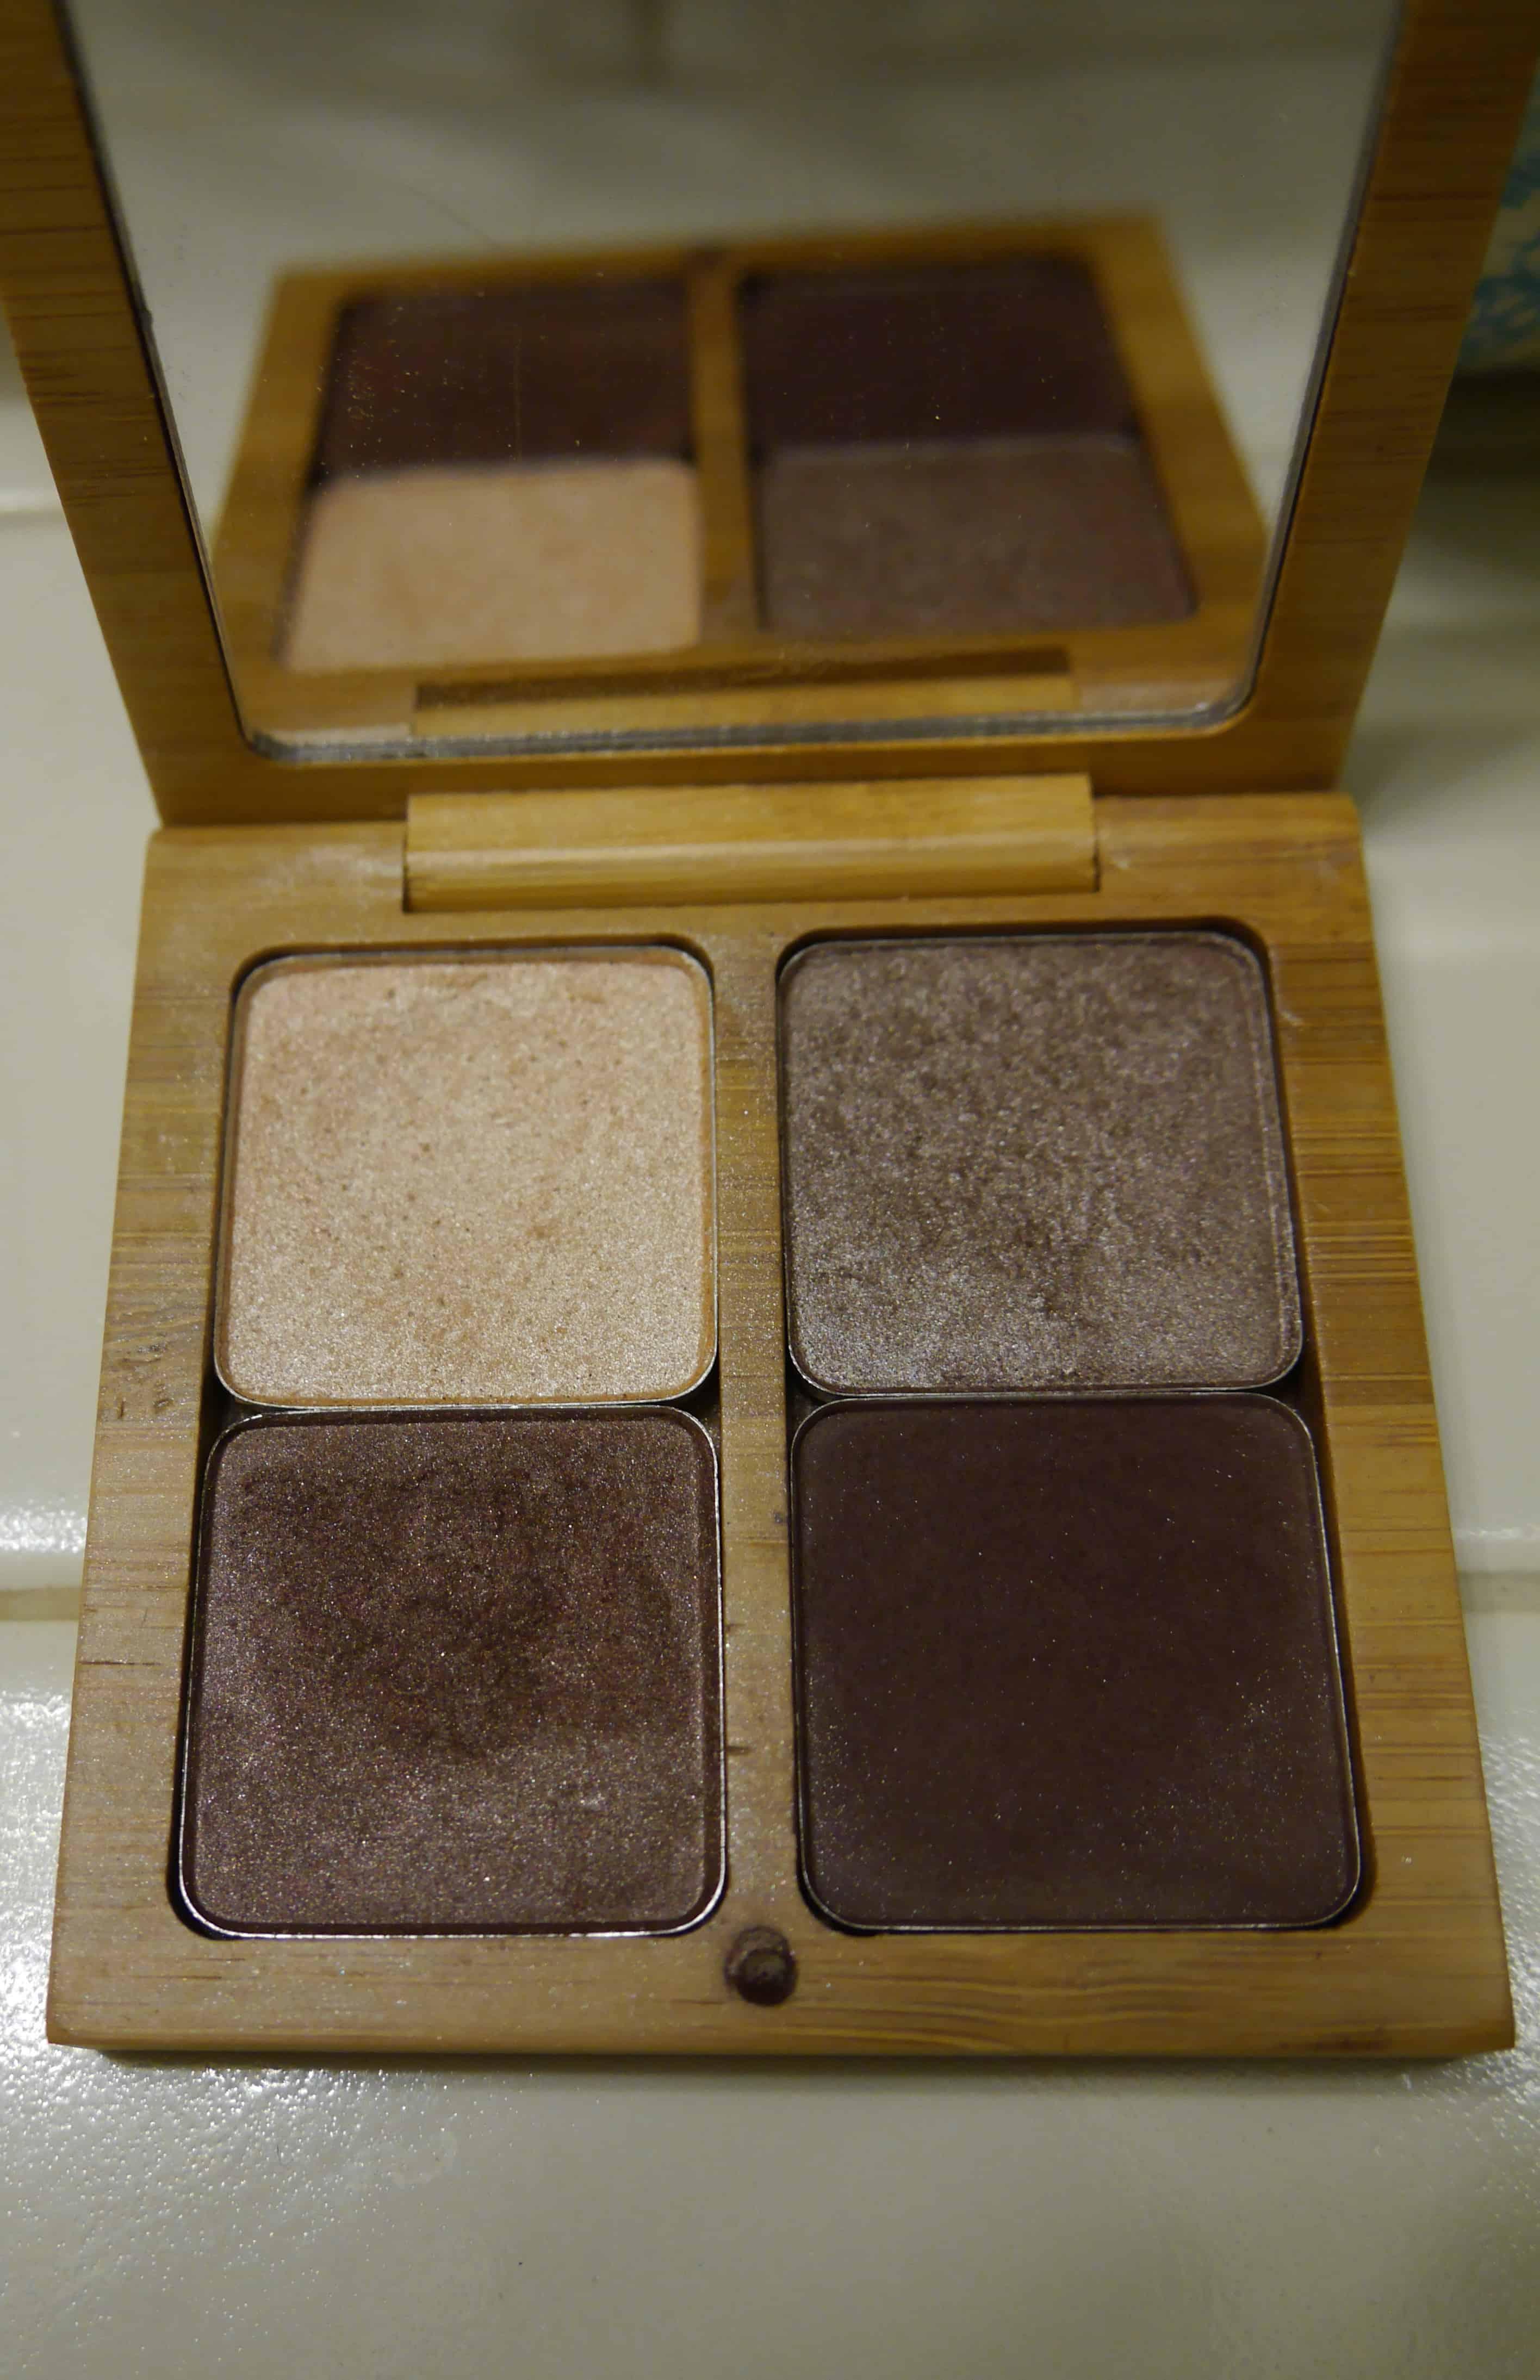 tarte-amazonian-clay-eyeshadow-quad-palette-eyeshadow-swatches.jpeg